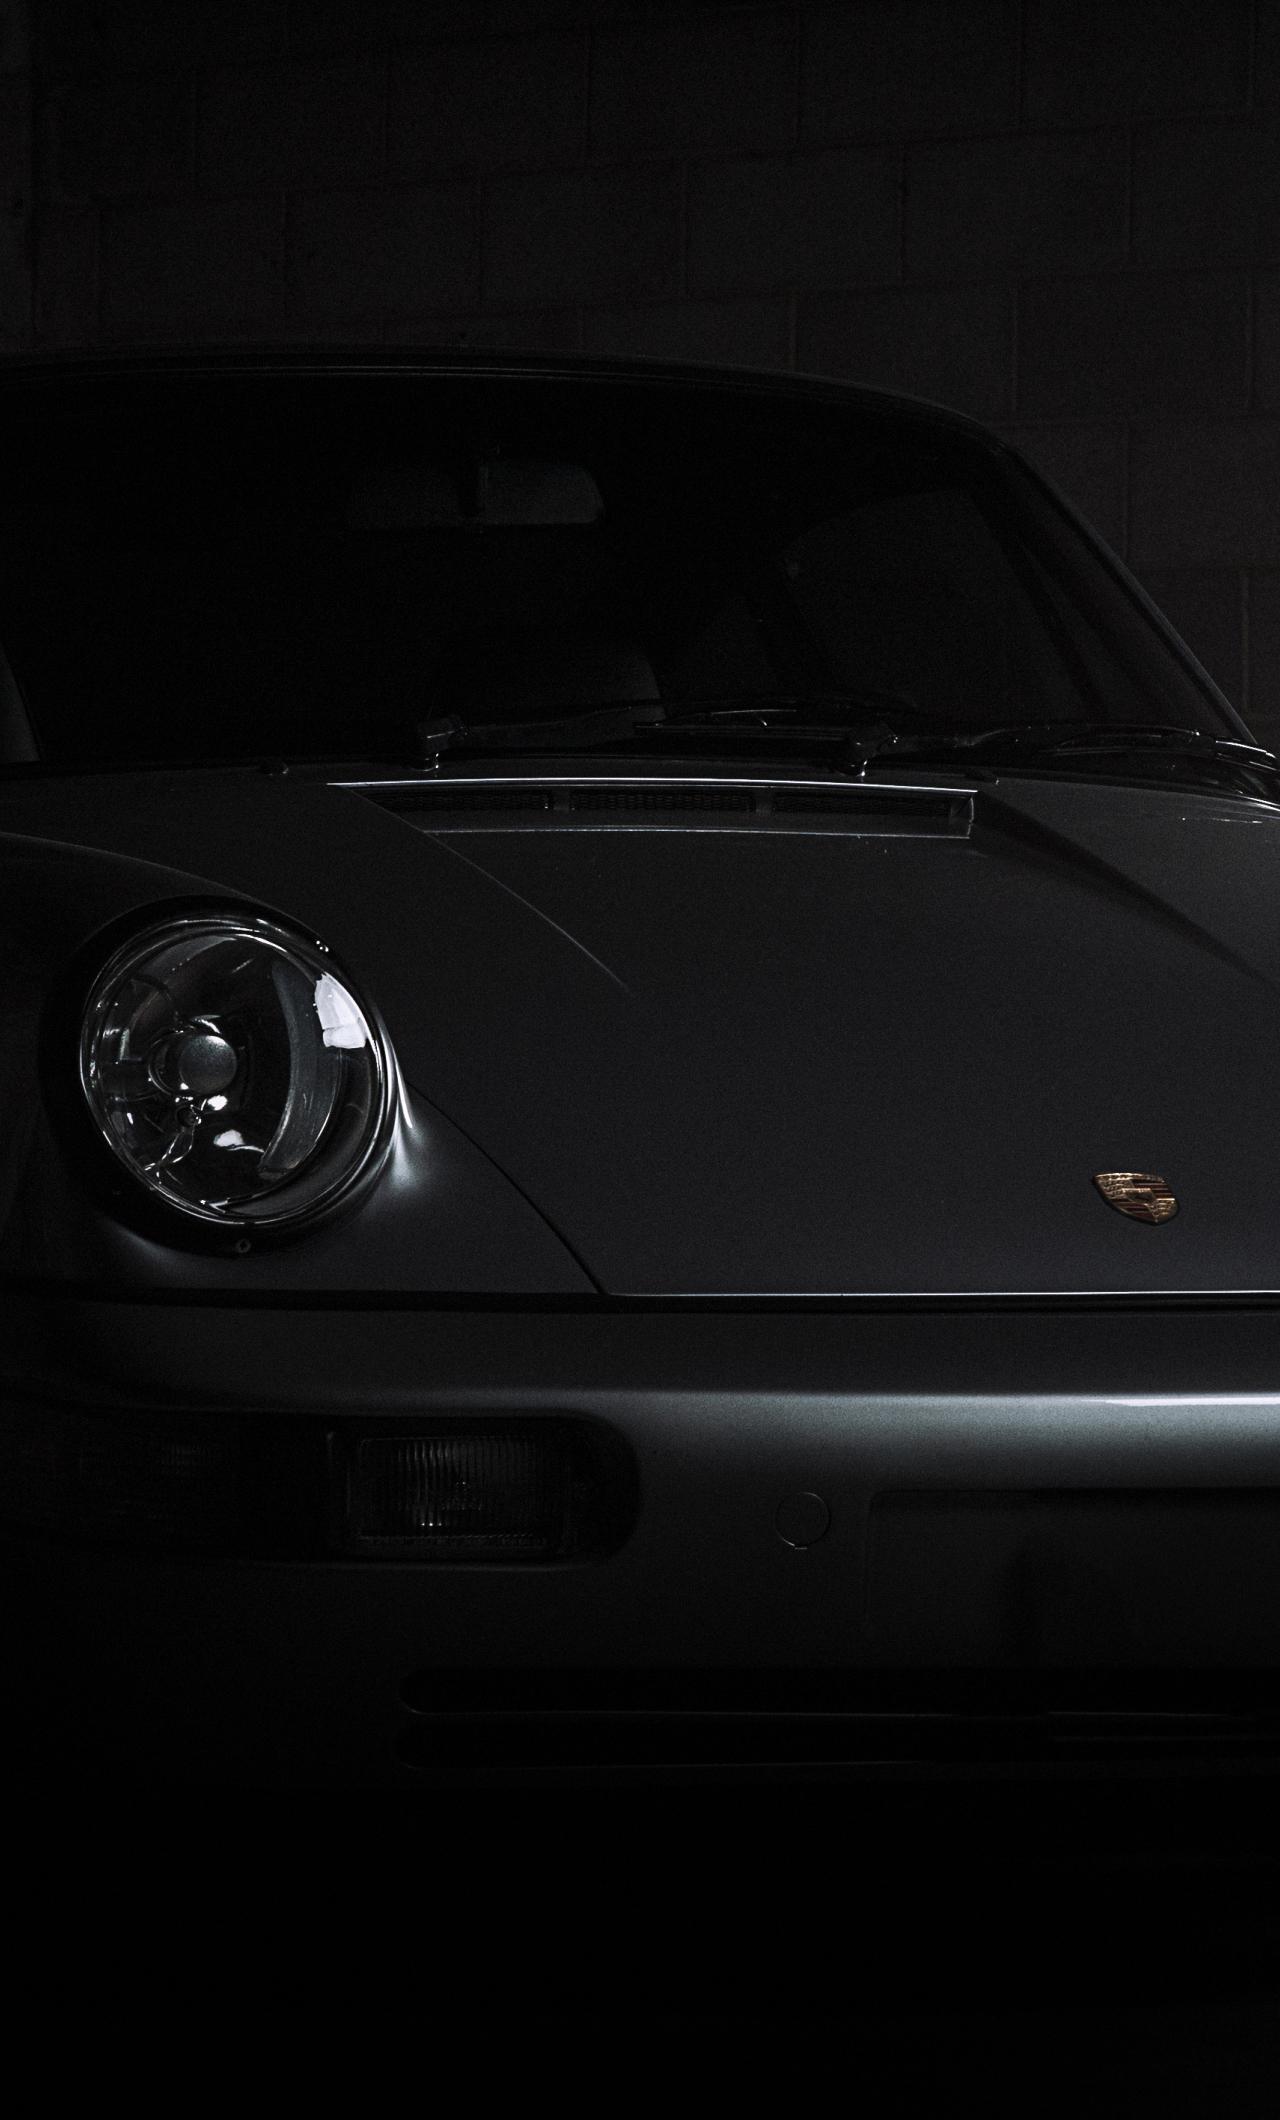 1280x2120 Porsche 911 Carrera Black Iphone 6 Plus Wallpaper